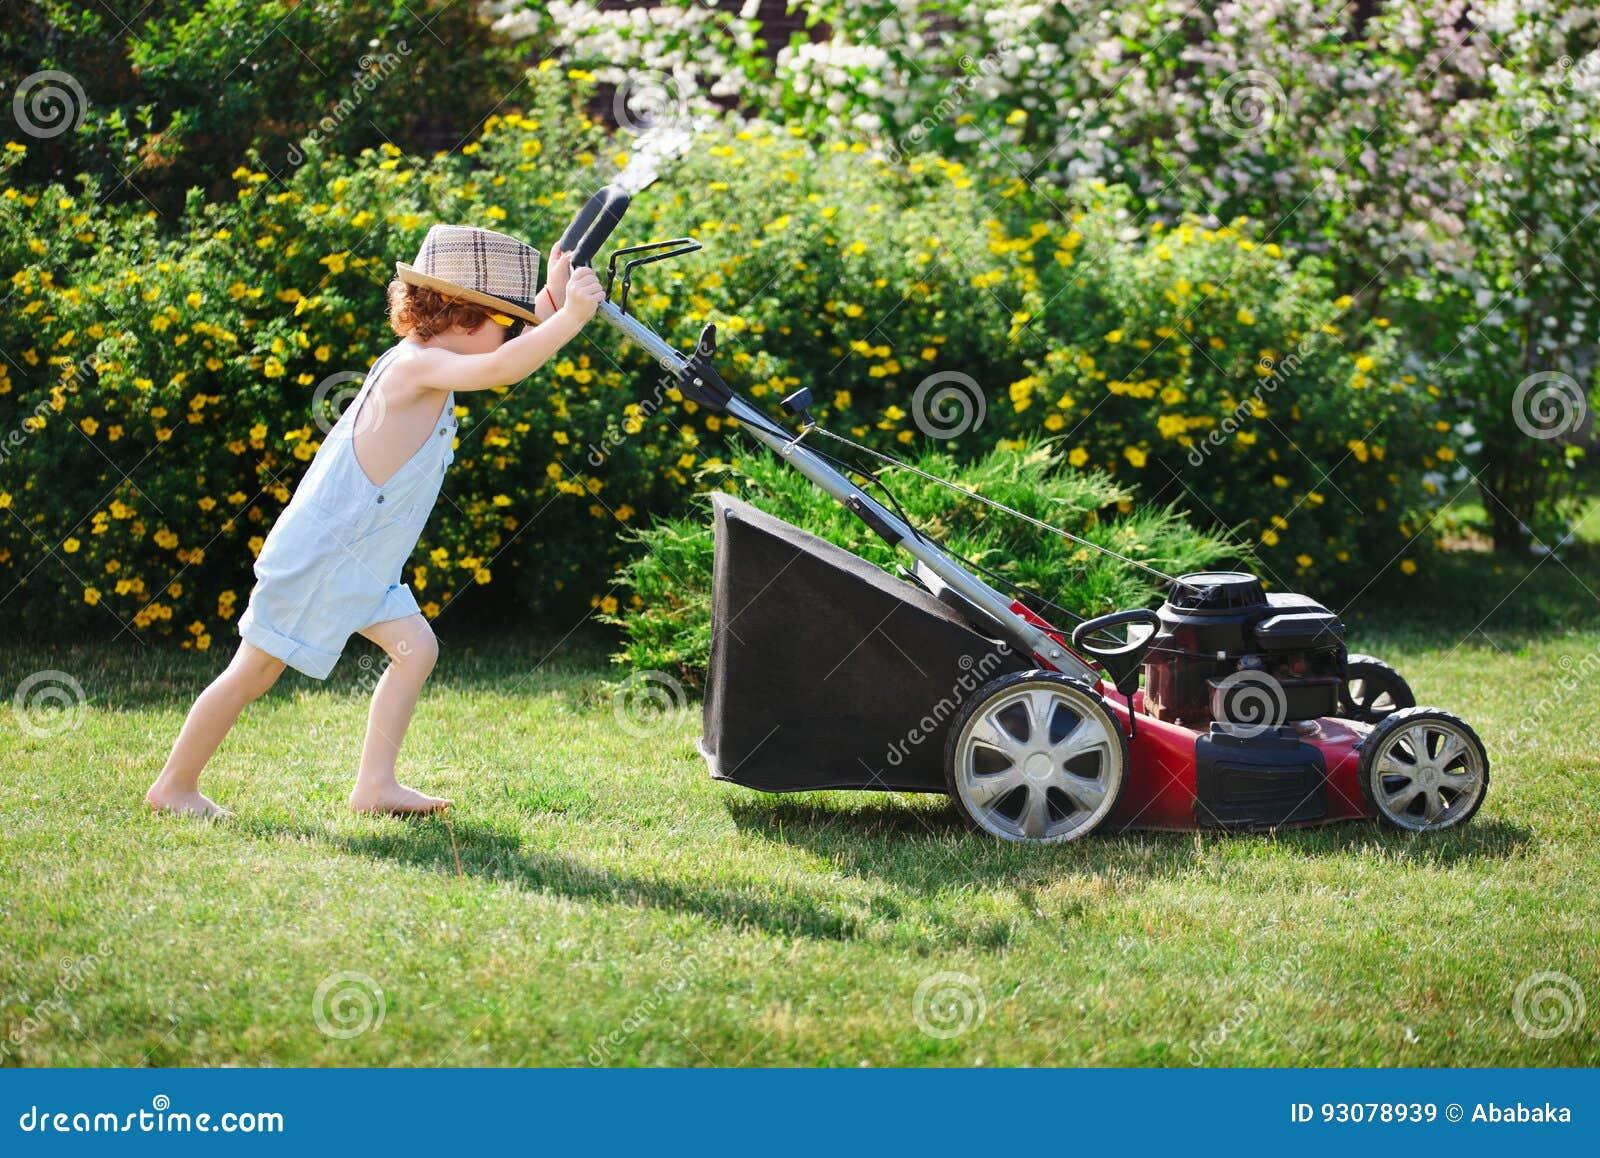 Kleiner Junge Maht Rasen Mit Maher Stockbild Bild Von Grun Maher